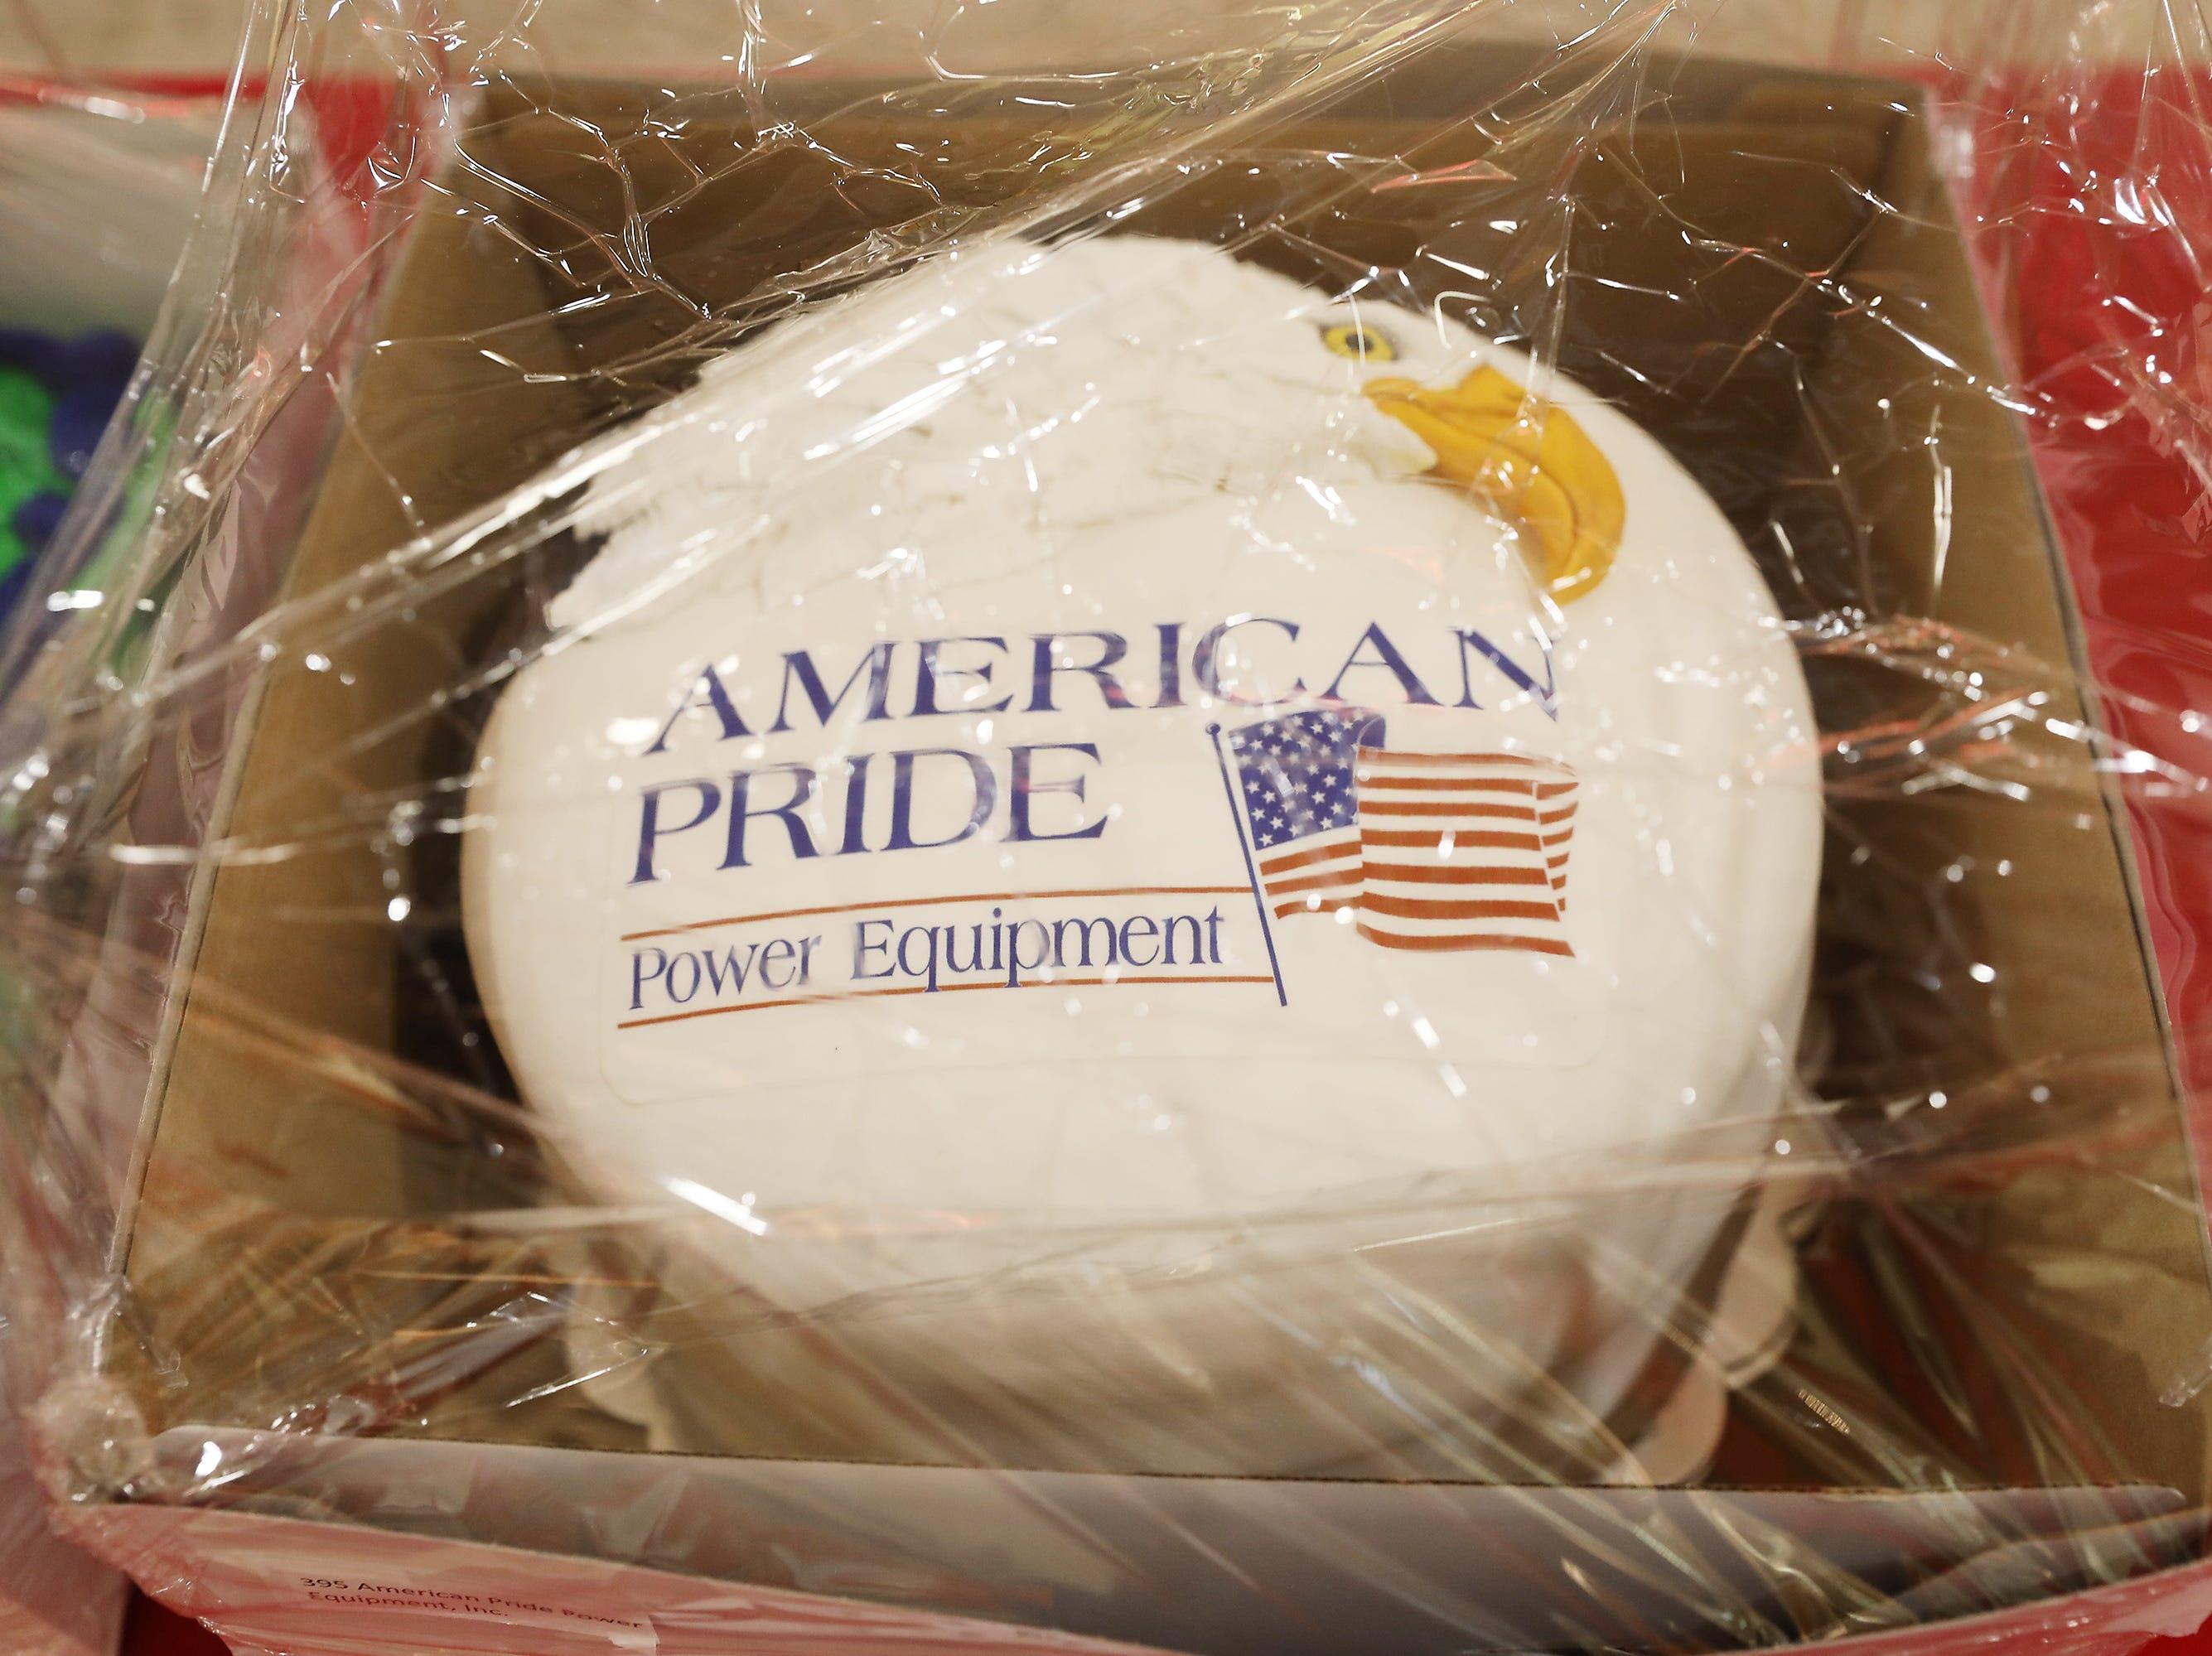 "5 P.M. Friday cake 395 American Pride Power Equipment - Cub Cadet CC800 33"" walk mower, electric start; $1,399"